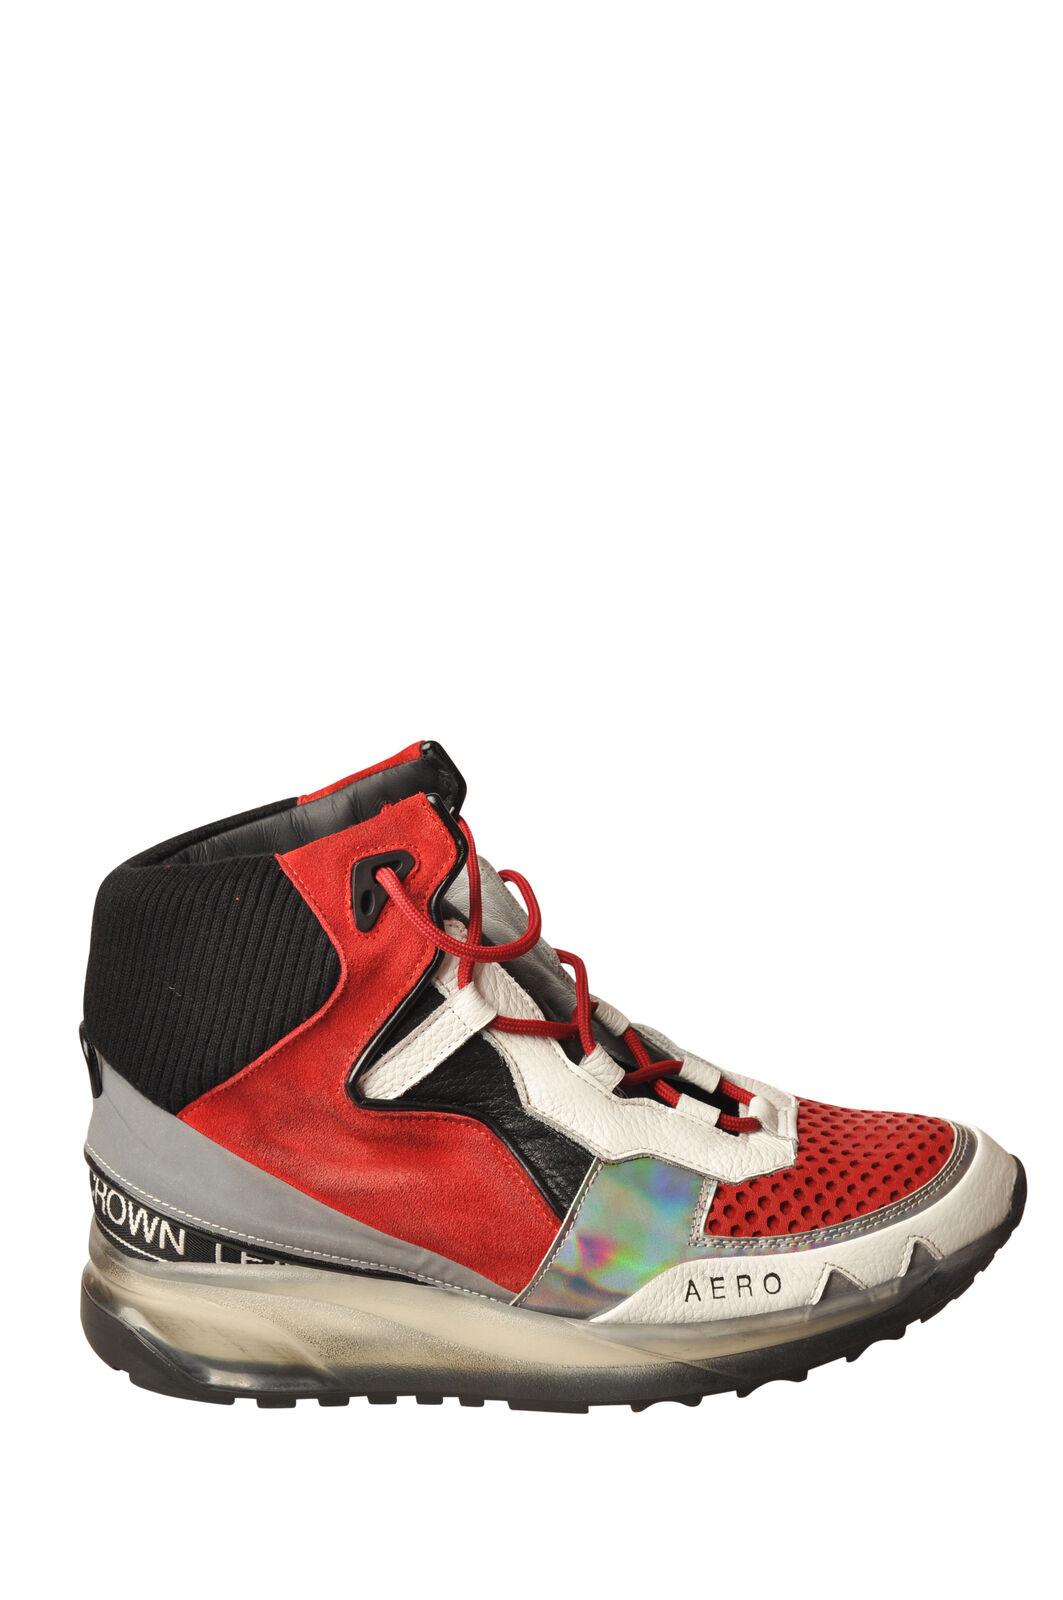 Leather Crown - Schuhe-Turnschuhe-hohe - Frau - Rot - 5859405A194034